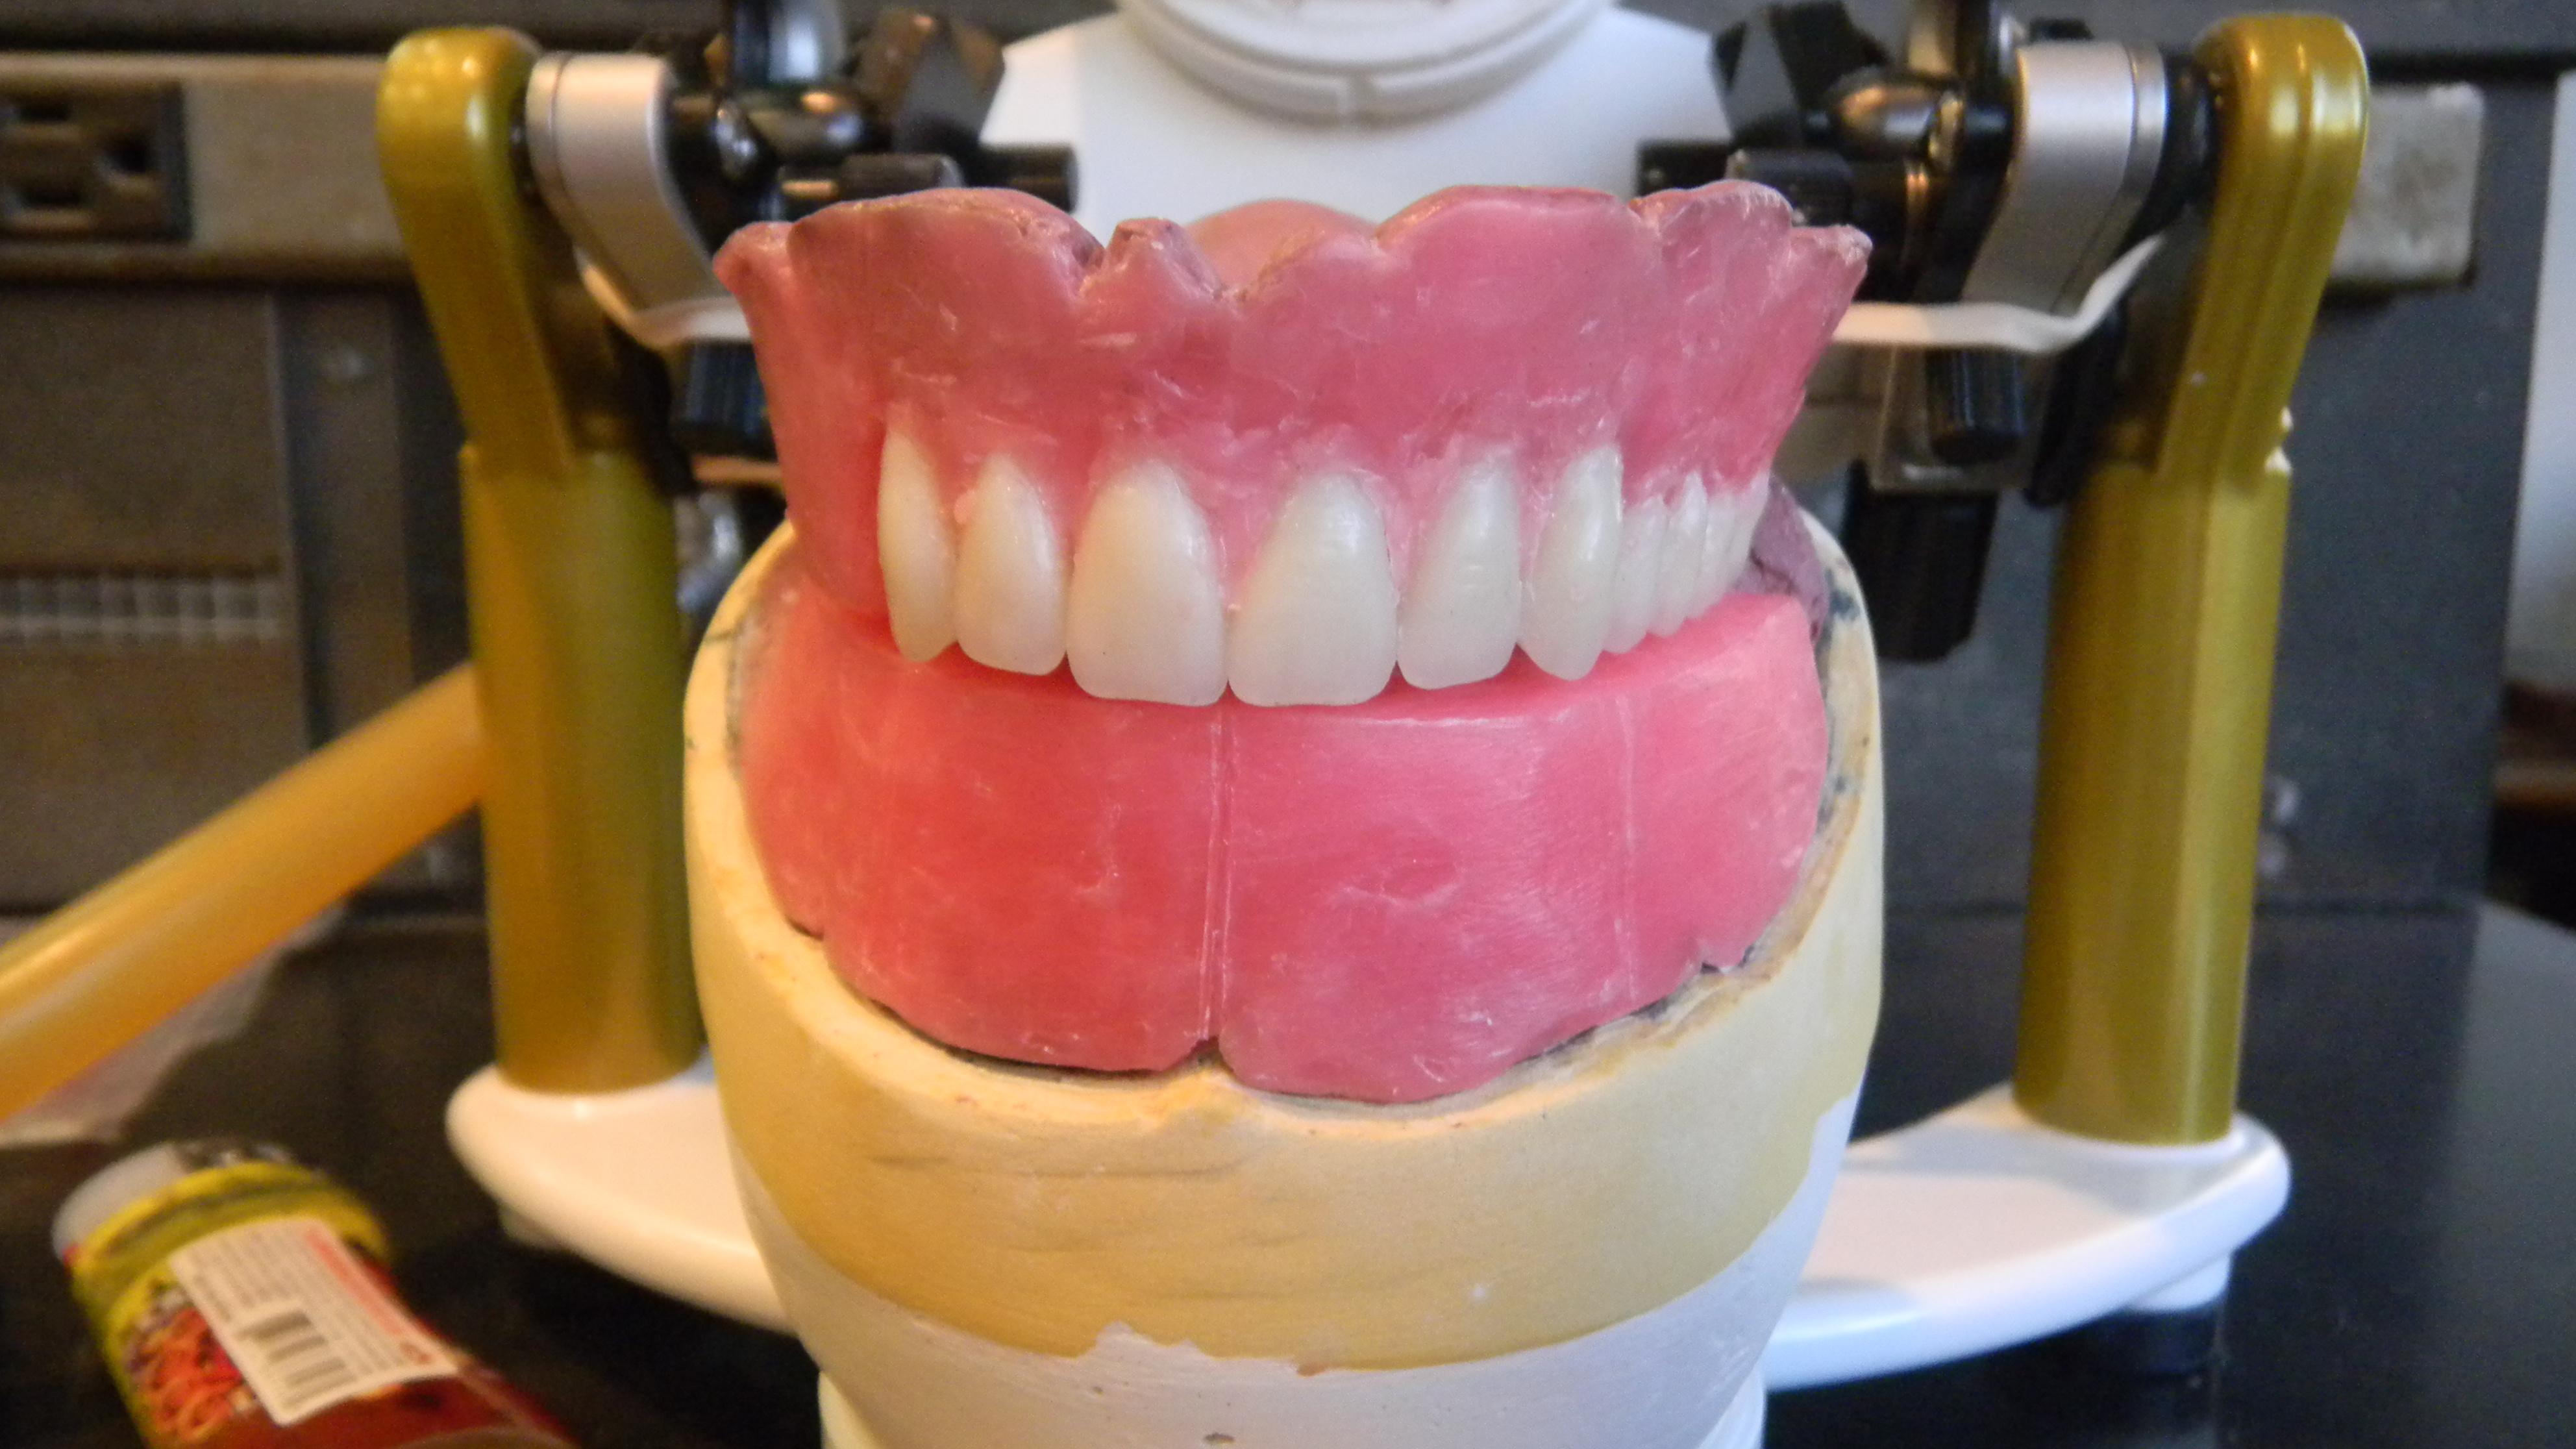 Complete Dentures | claudia leyton\'s ePortfolio